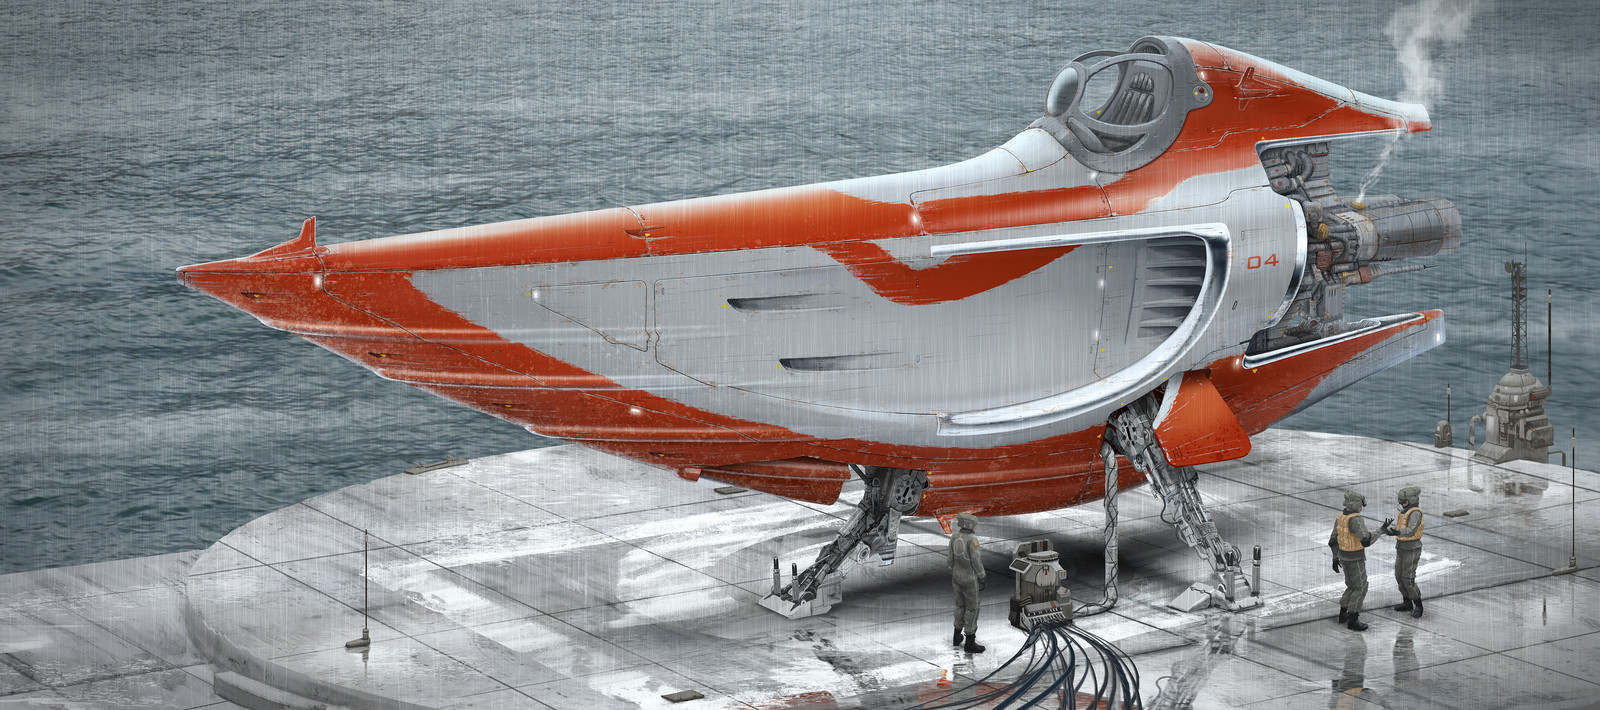 Spaceship Painting .1